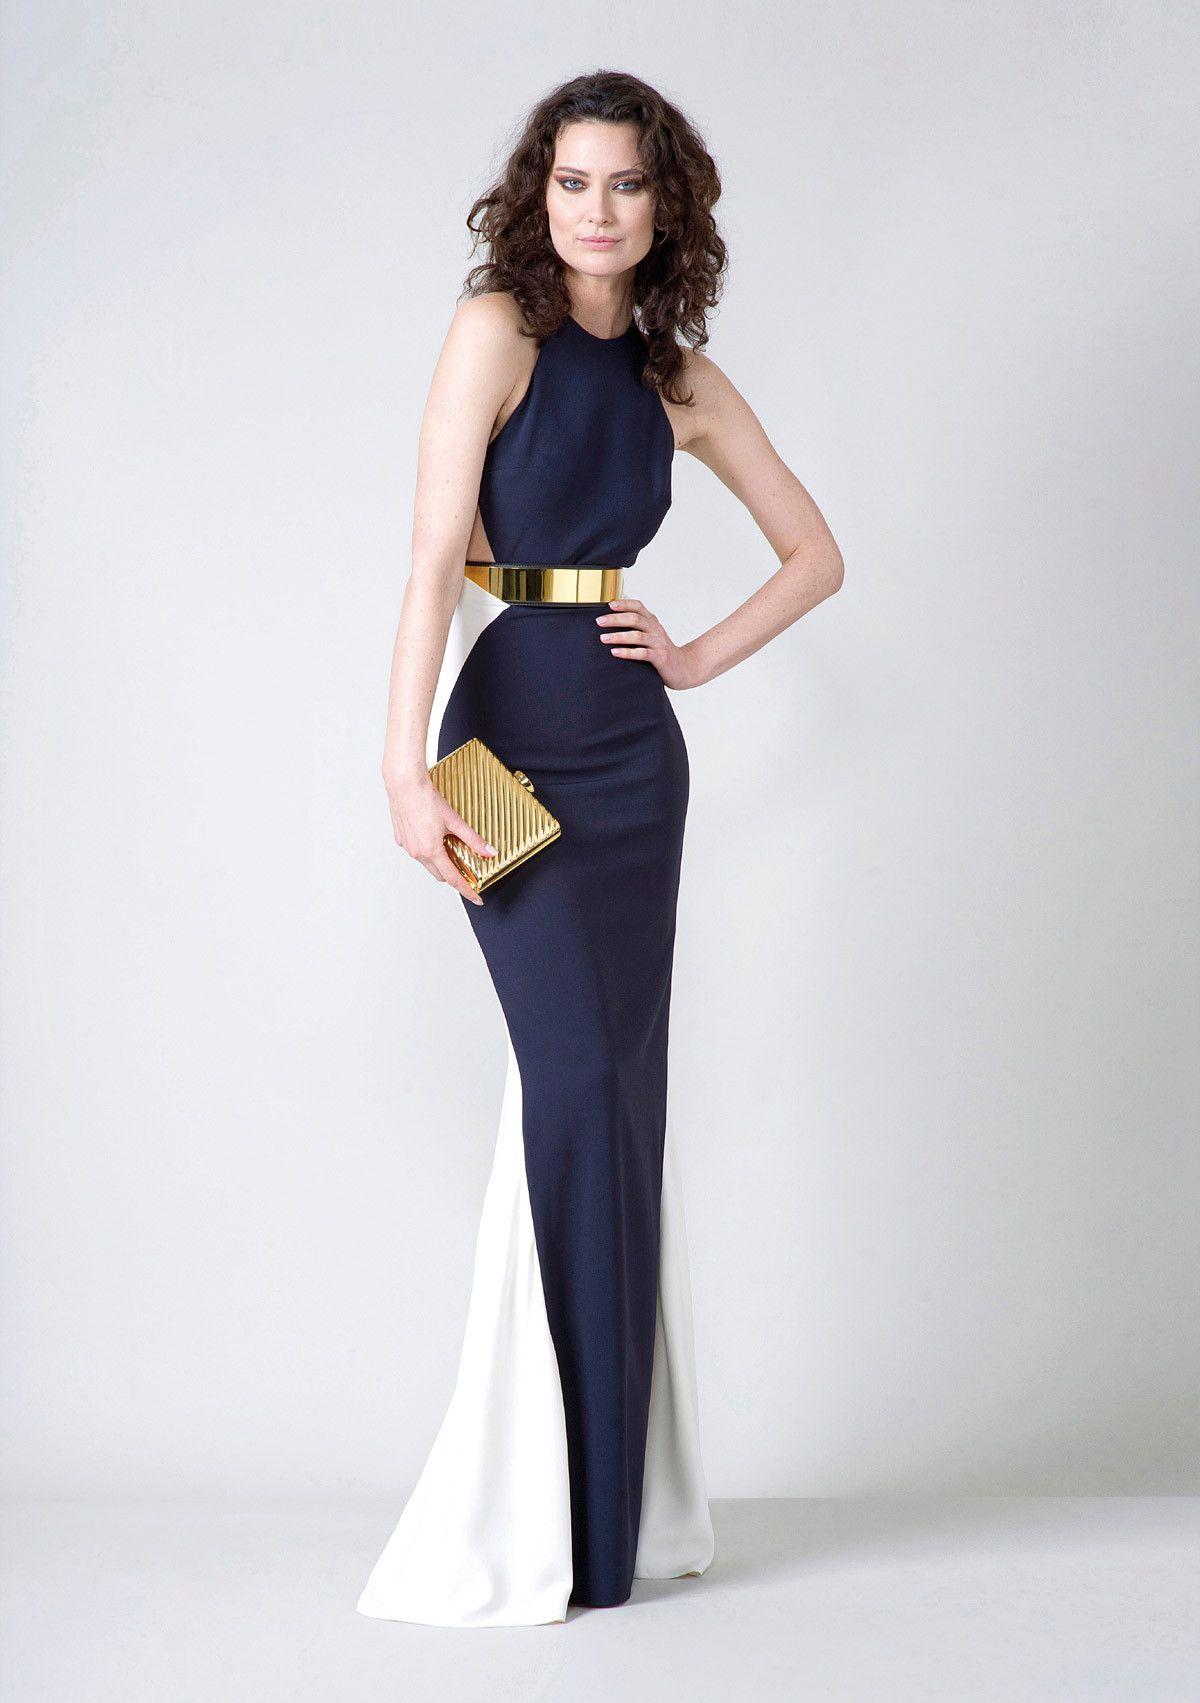 stella mccartney evening gowns | Women\'s Fashion | Pinterest ...